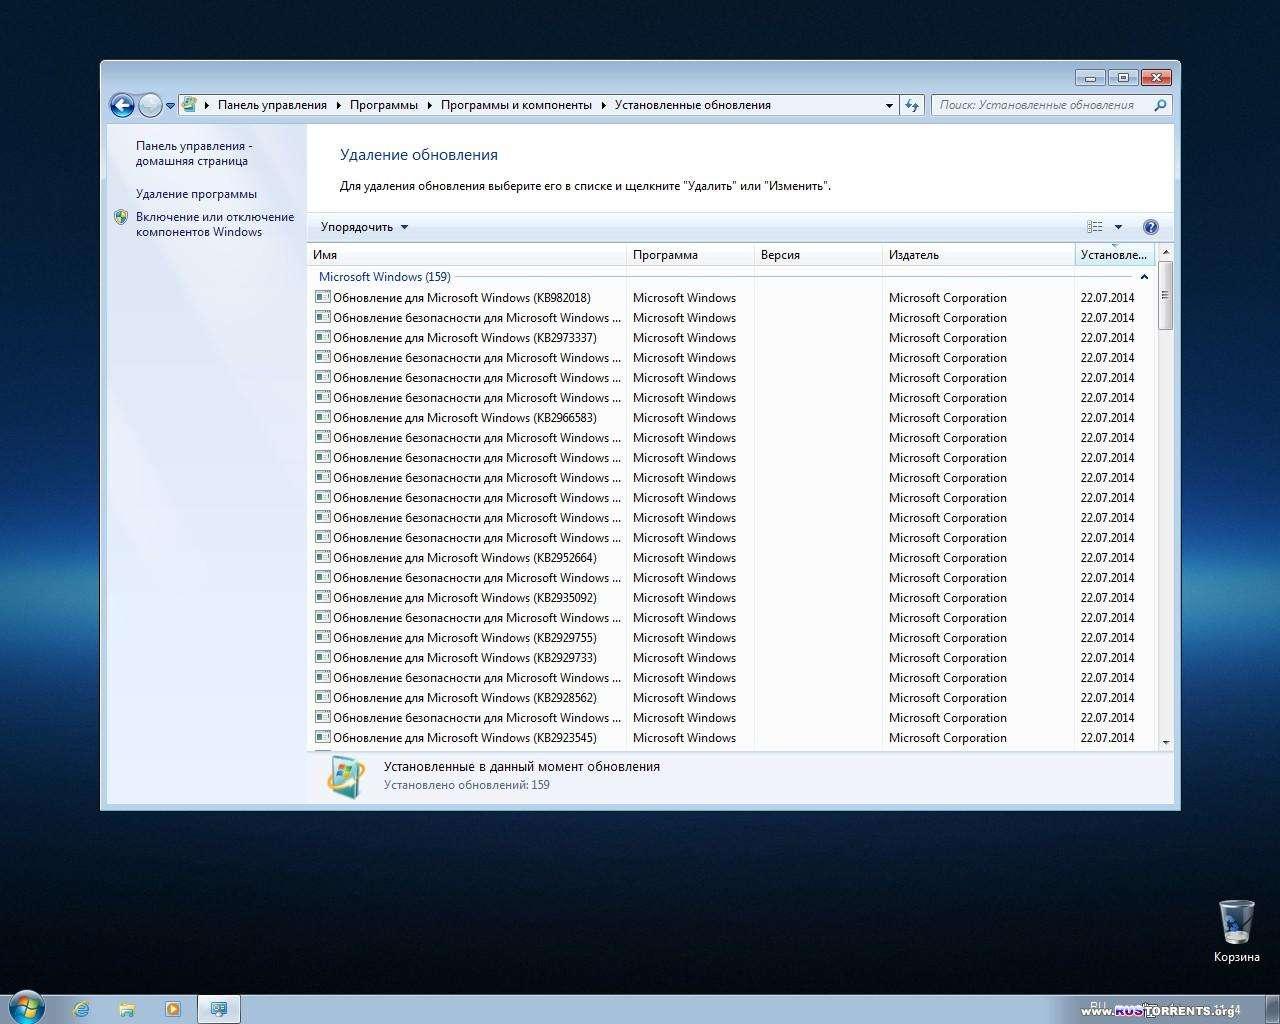 Windows 7 Home Basic SP1 �86/�64 Elgujakviso Edition v.17.07.14 RUS | PC